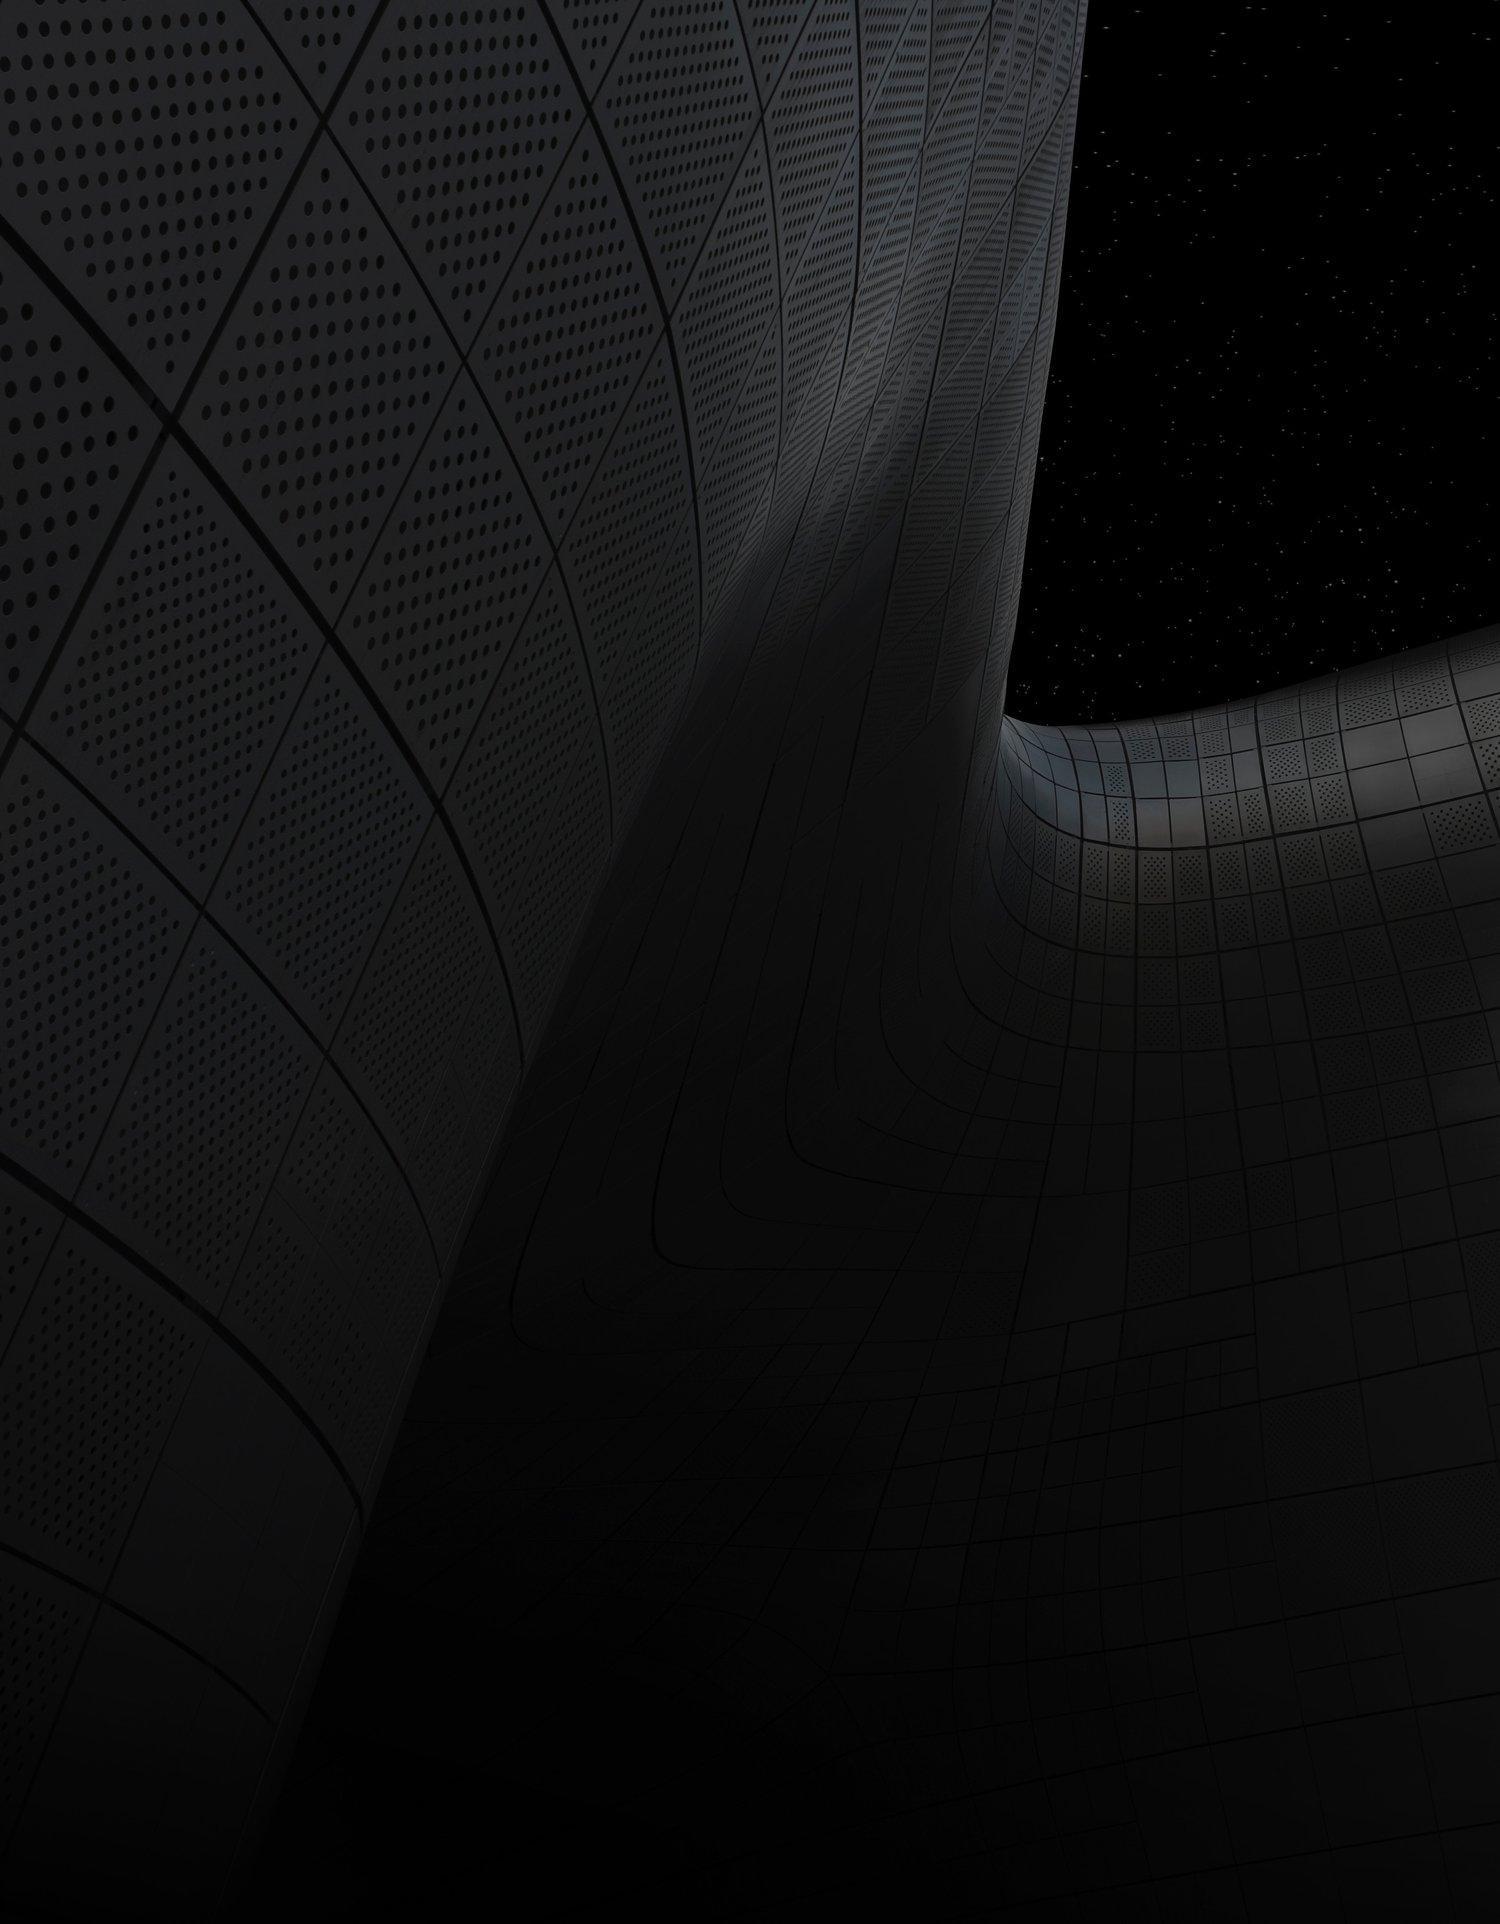 iPhone Dark Mode Wallpapers - Wallpaper Cave